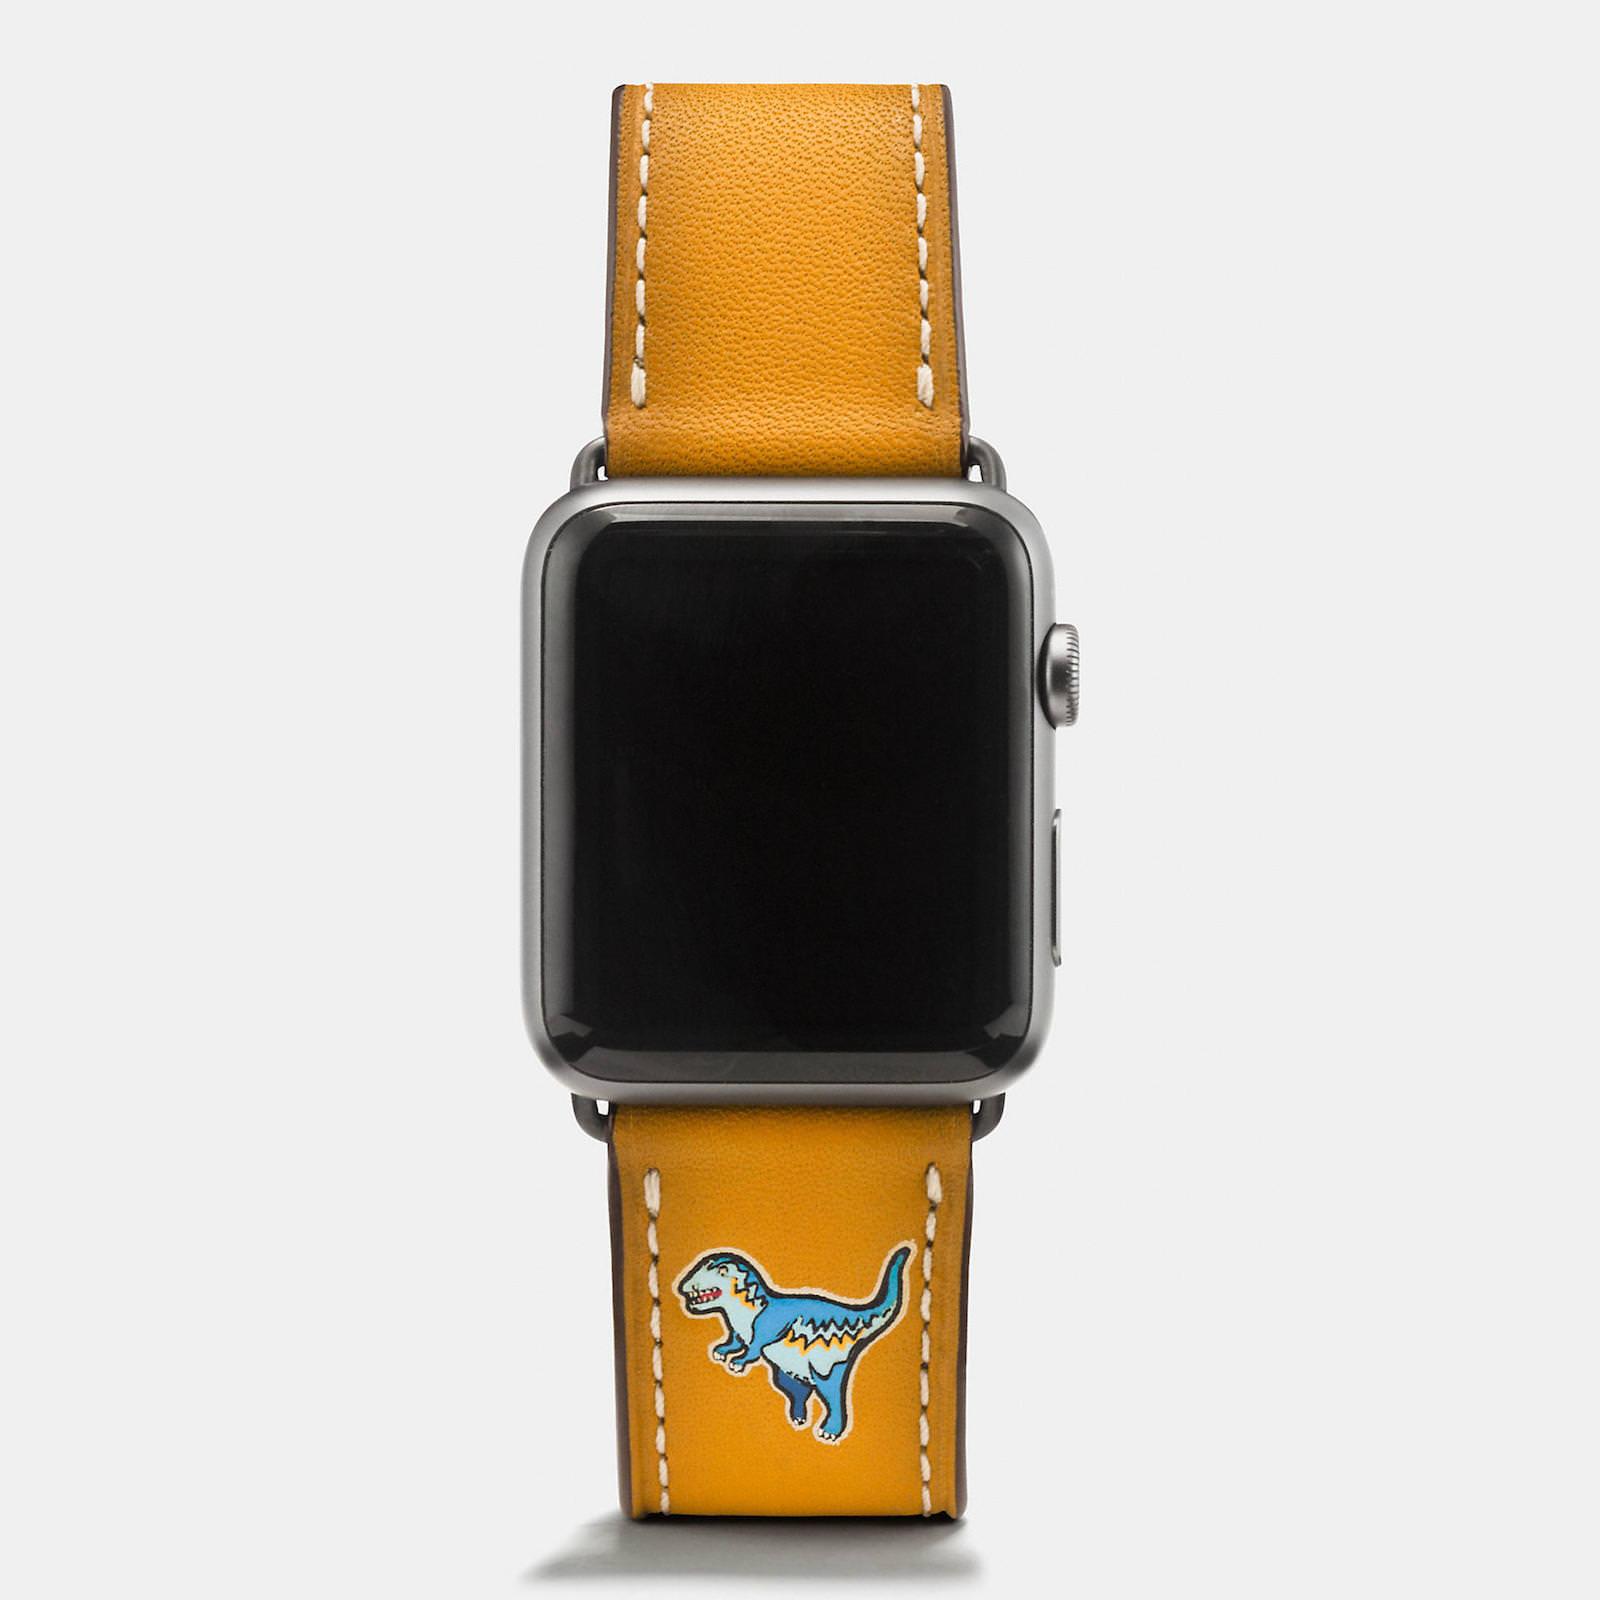 Apple-Watch-Coach-Band-Autumn-Season-3.jpeg